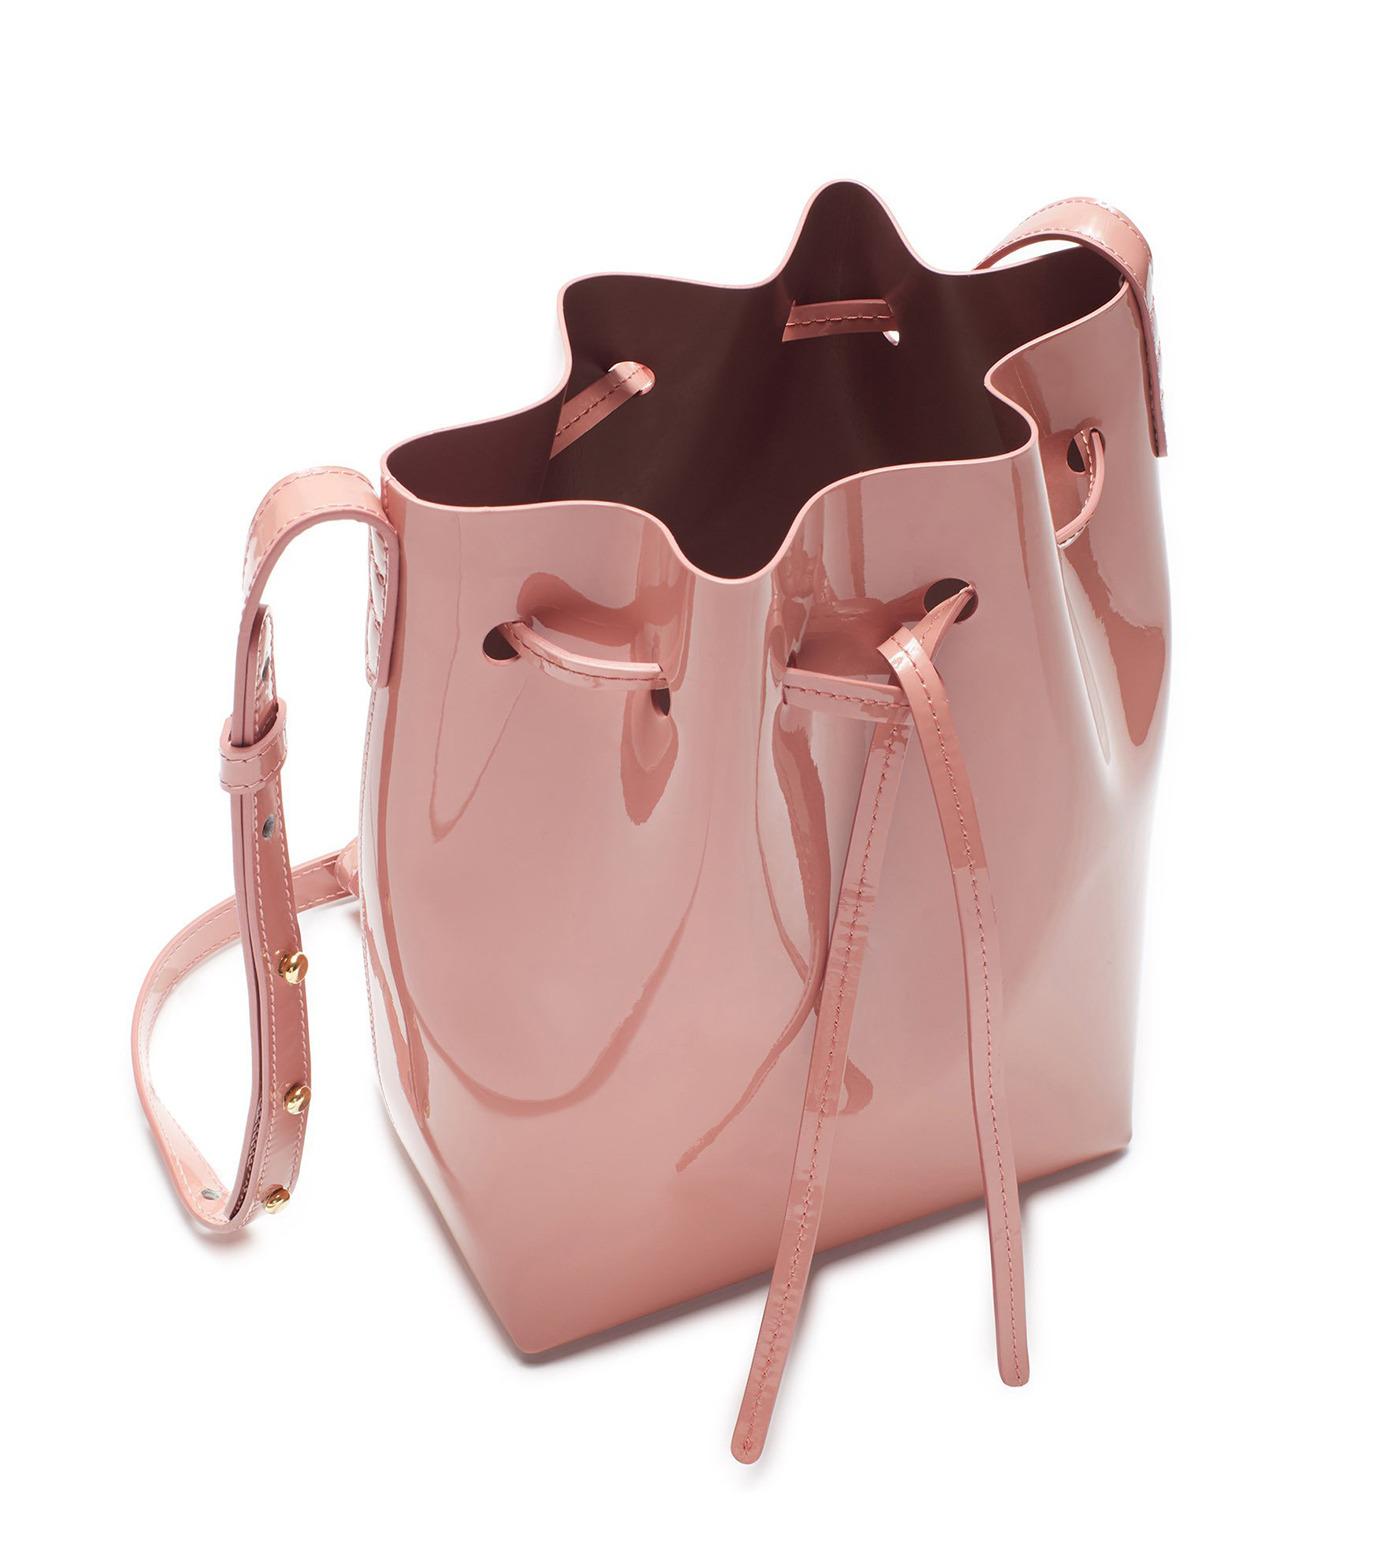 Mansur Gavriel(マンサーガブリエル)のpatent mini bucket bag-LIGHT PINK(ハンドバッグ/hand bag)-HMB004PA-71 拡大詳細画像3